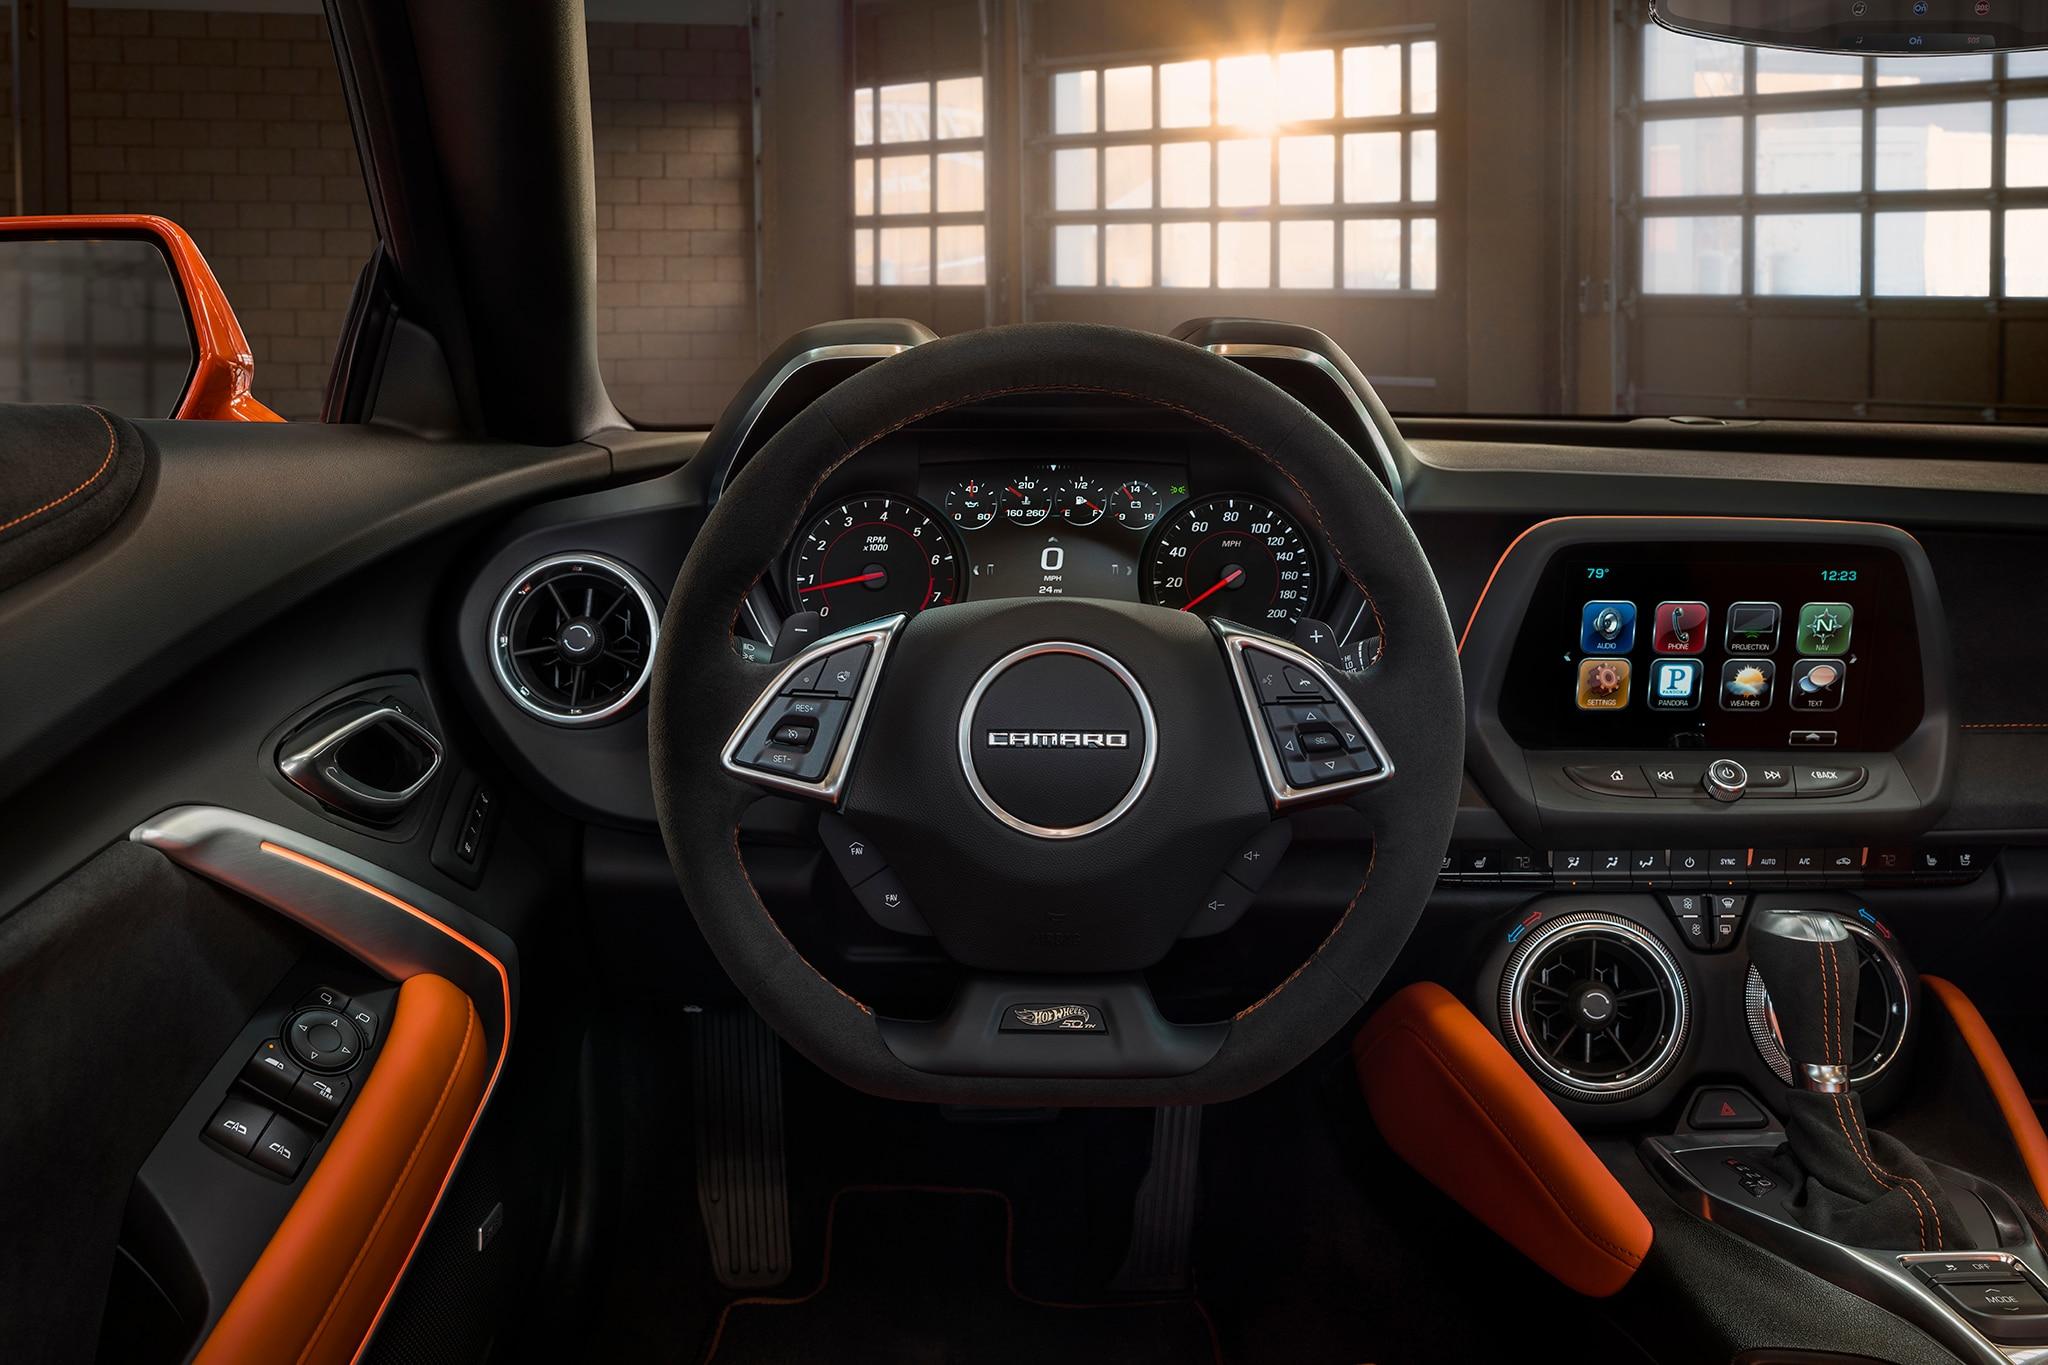 2018 Chevrolet Camaro Hot Wheels Edition Unveiled Ahead Of Sema